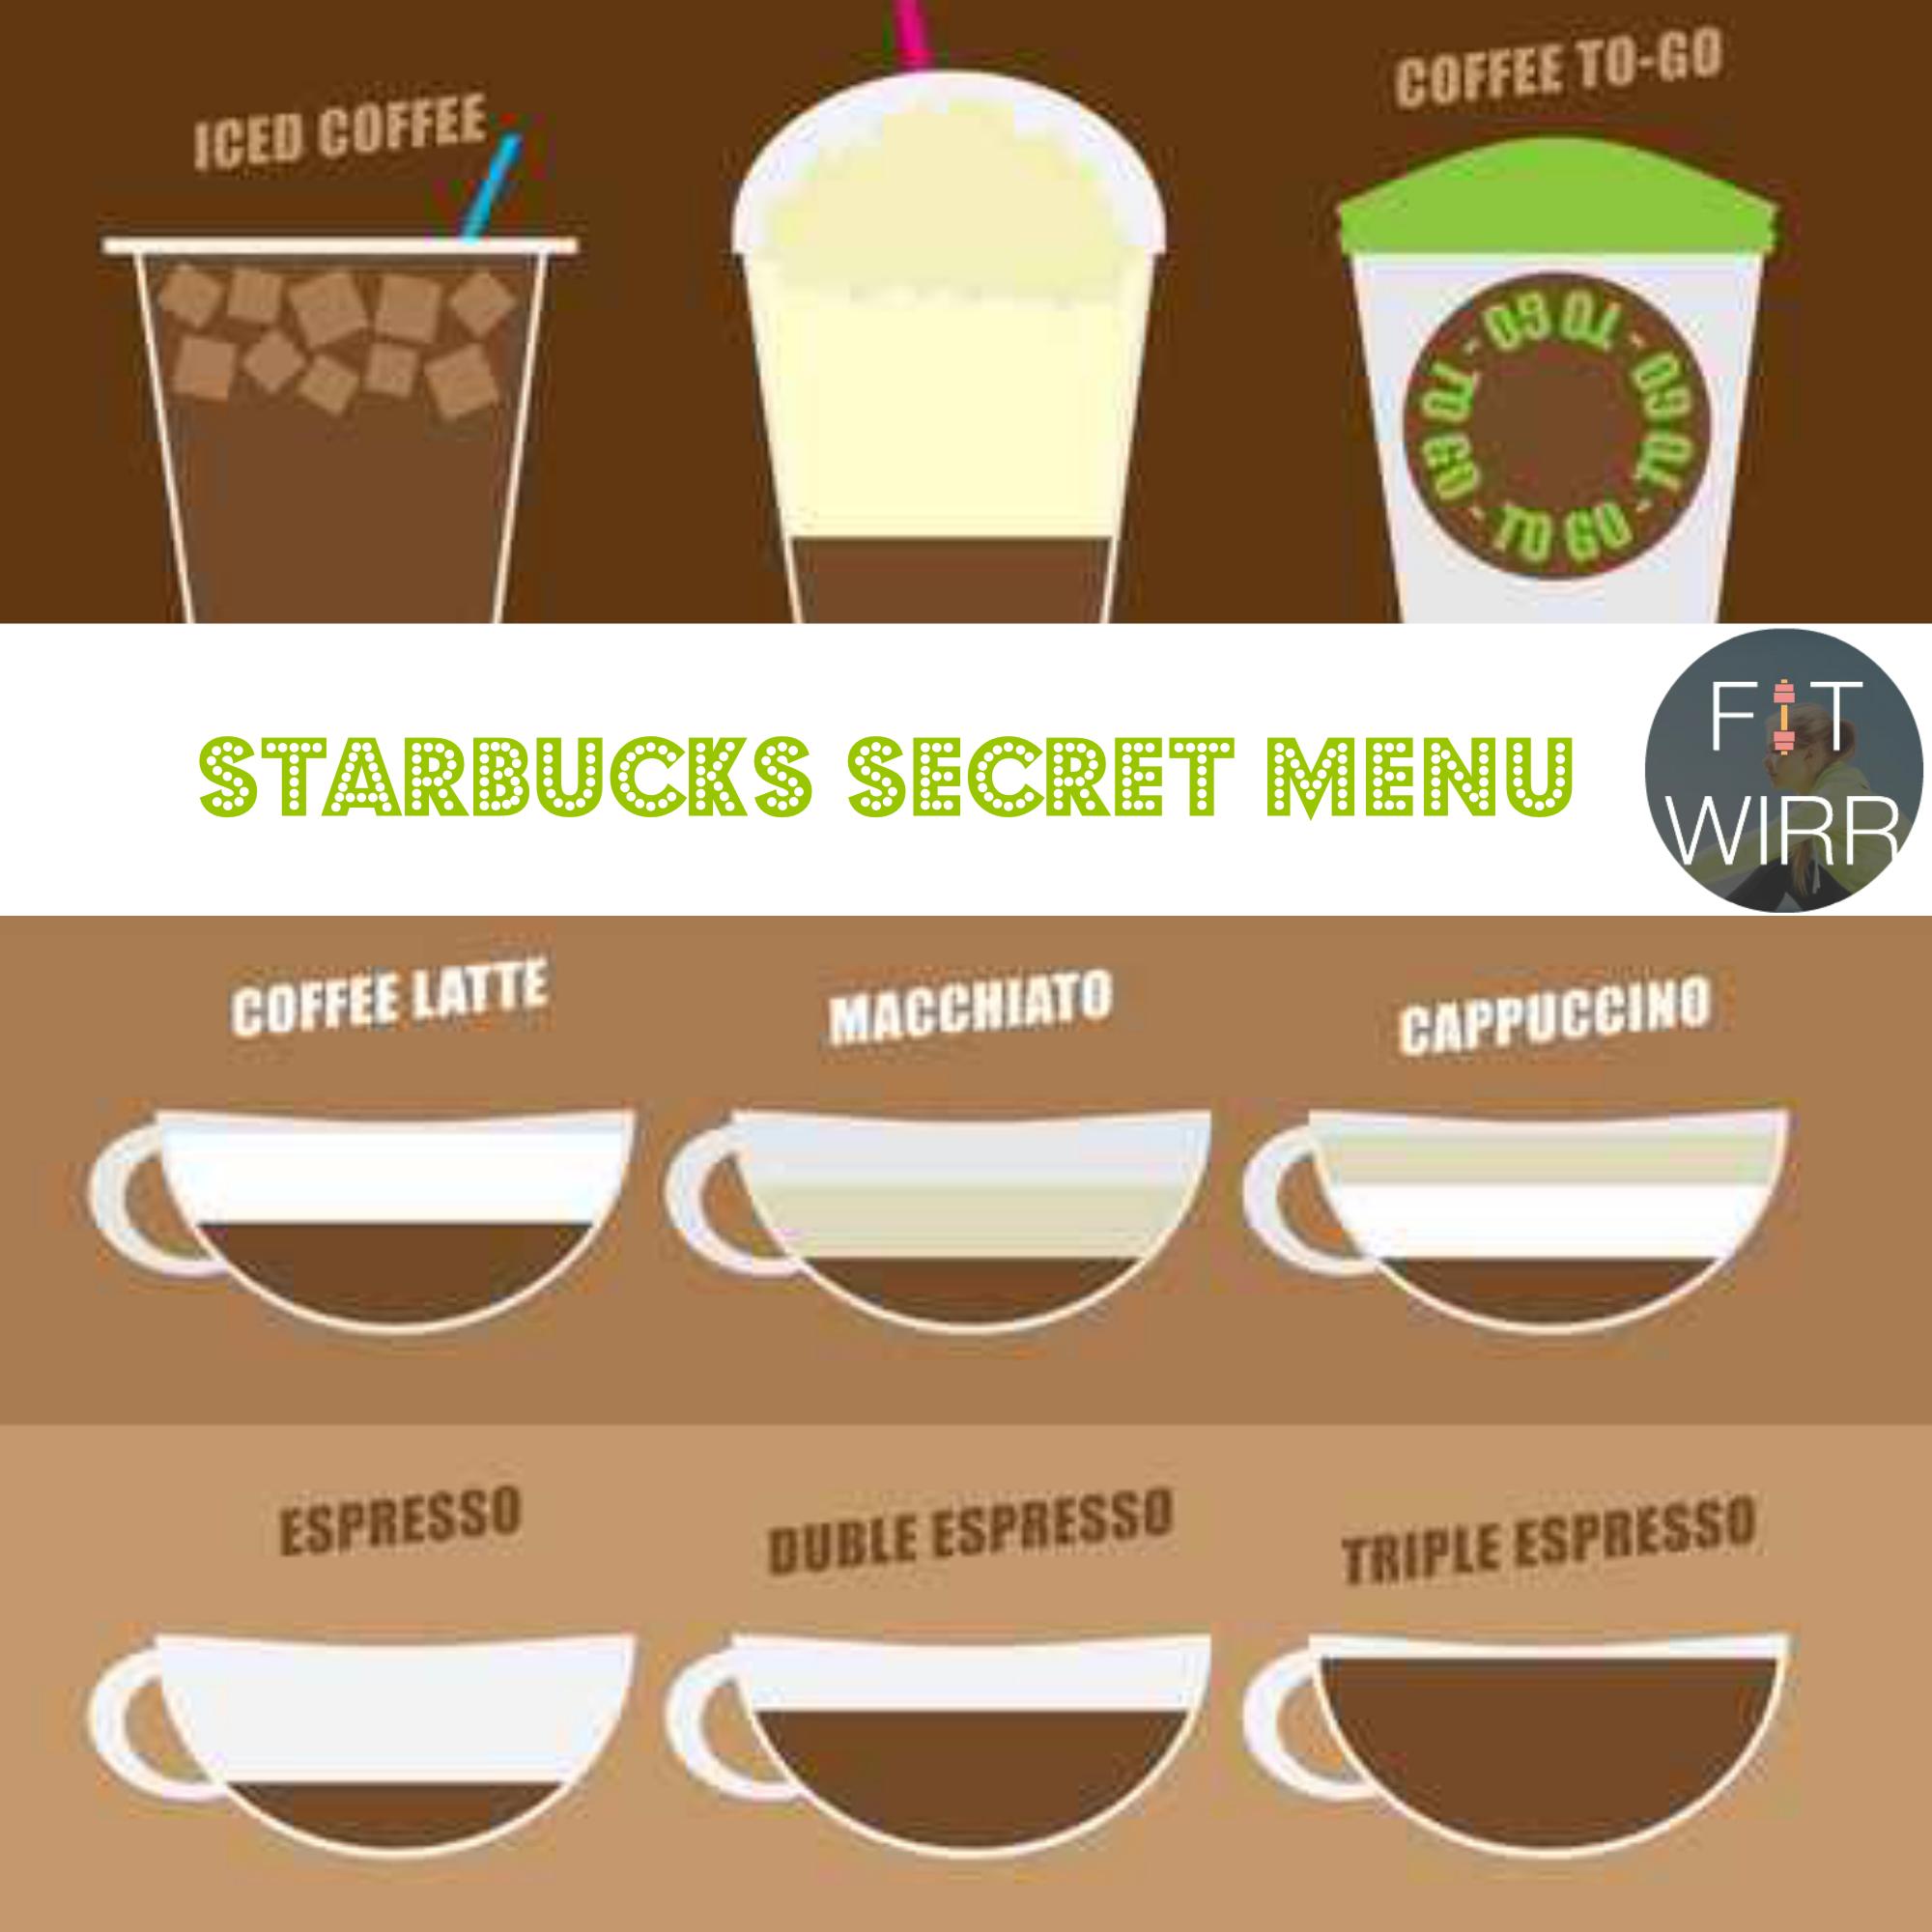 Starbucks Calories | Secret menu, Starbucks coffee and ...